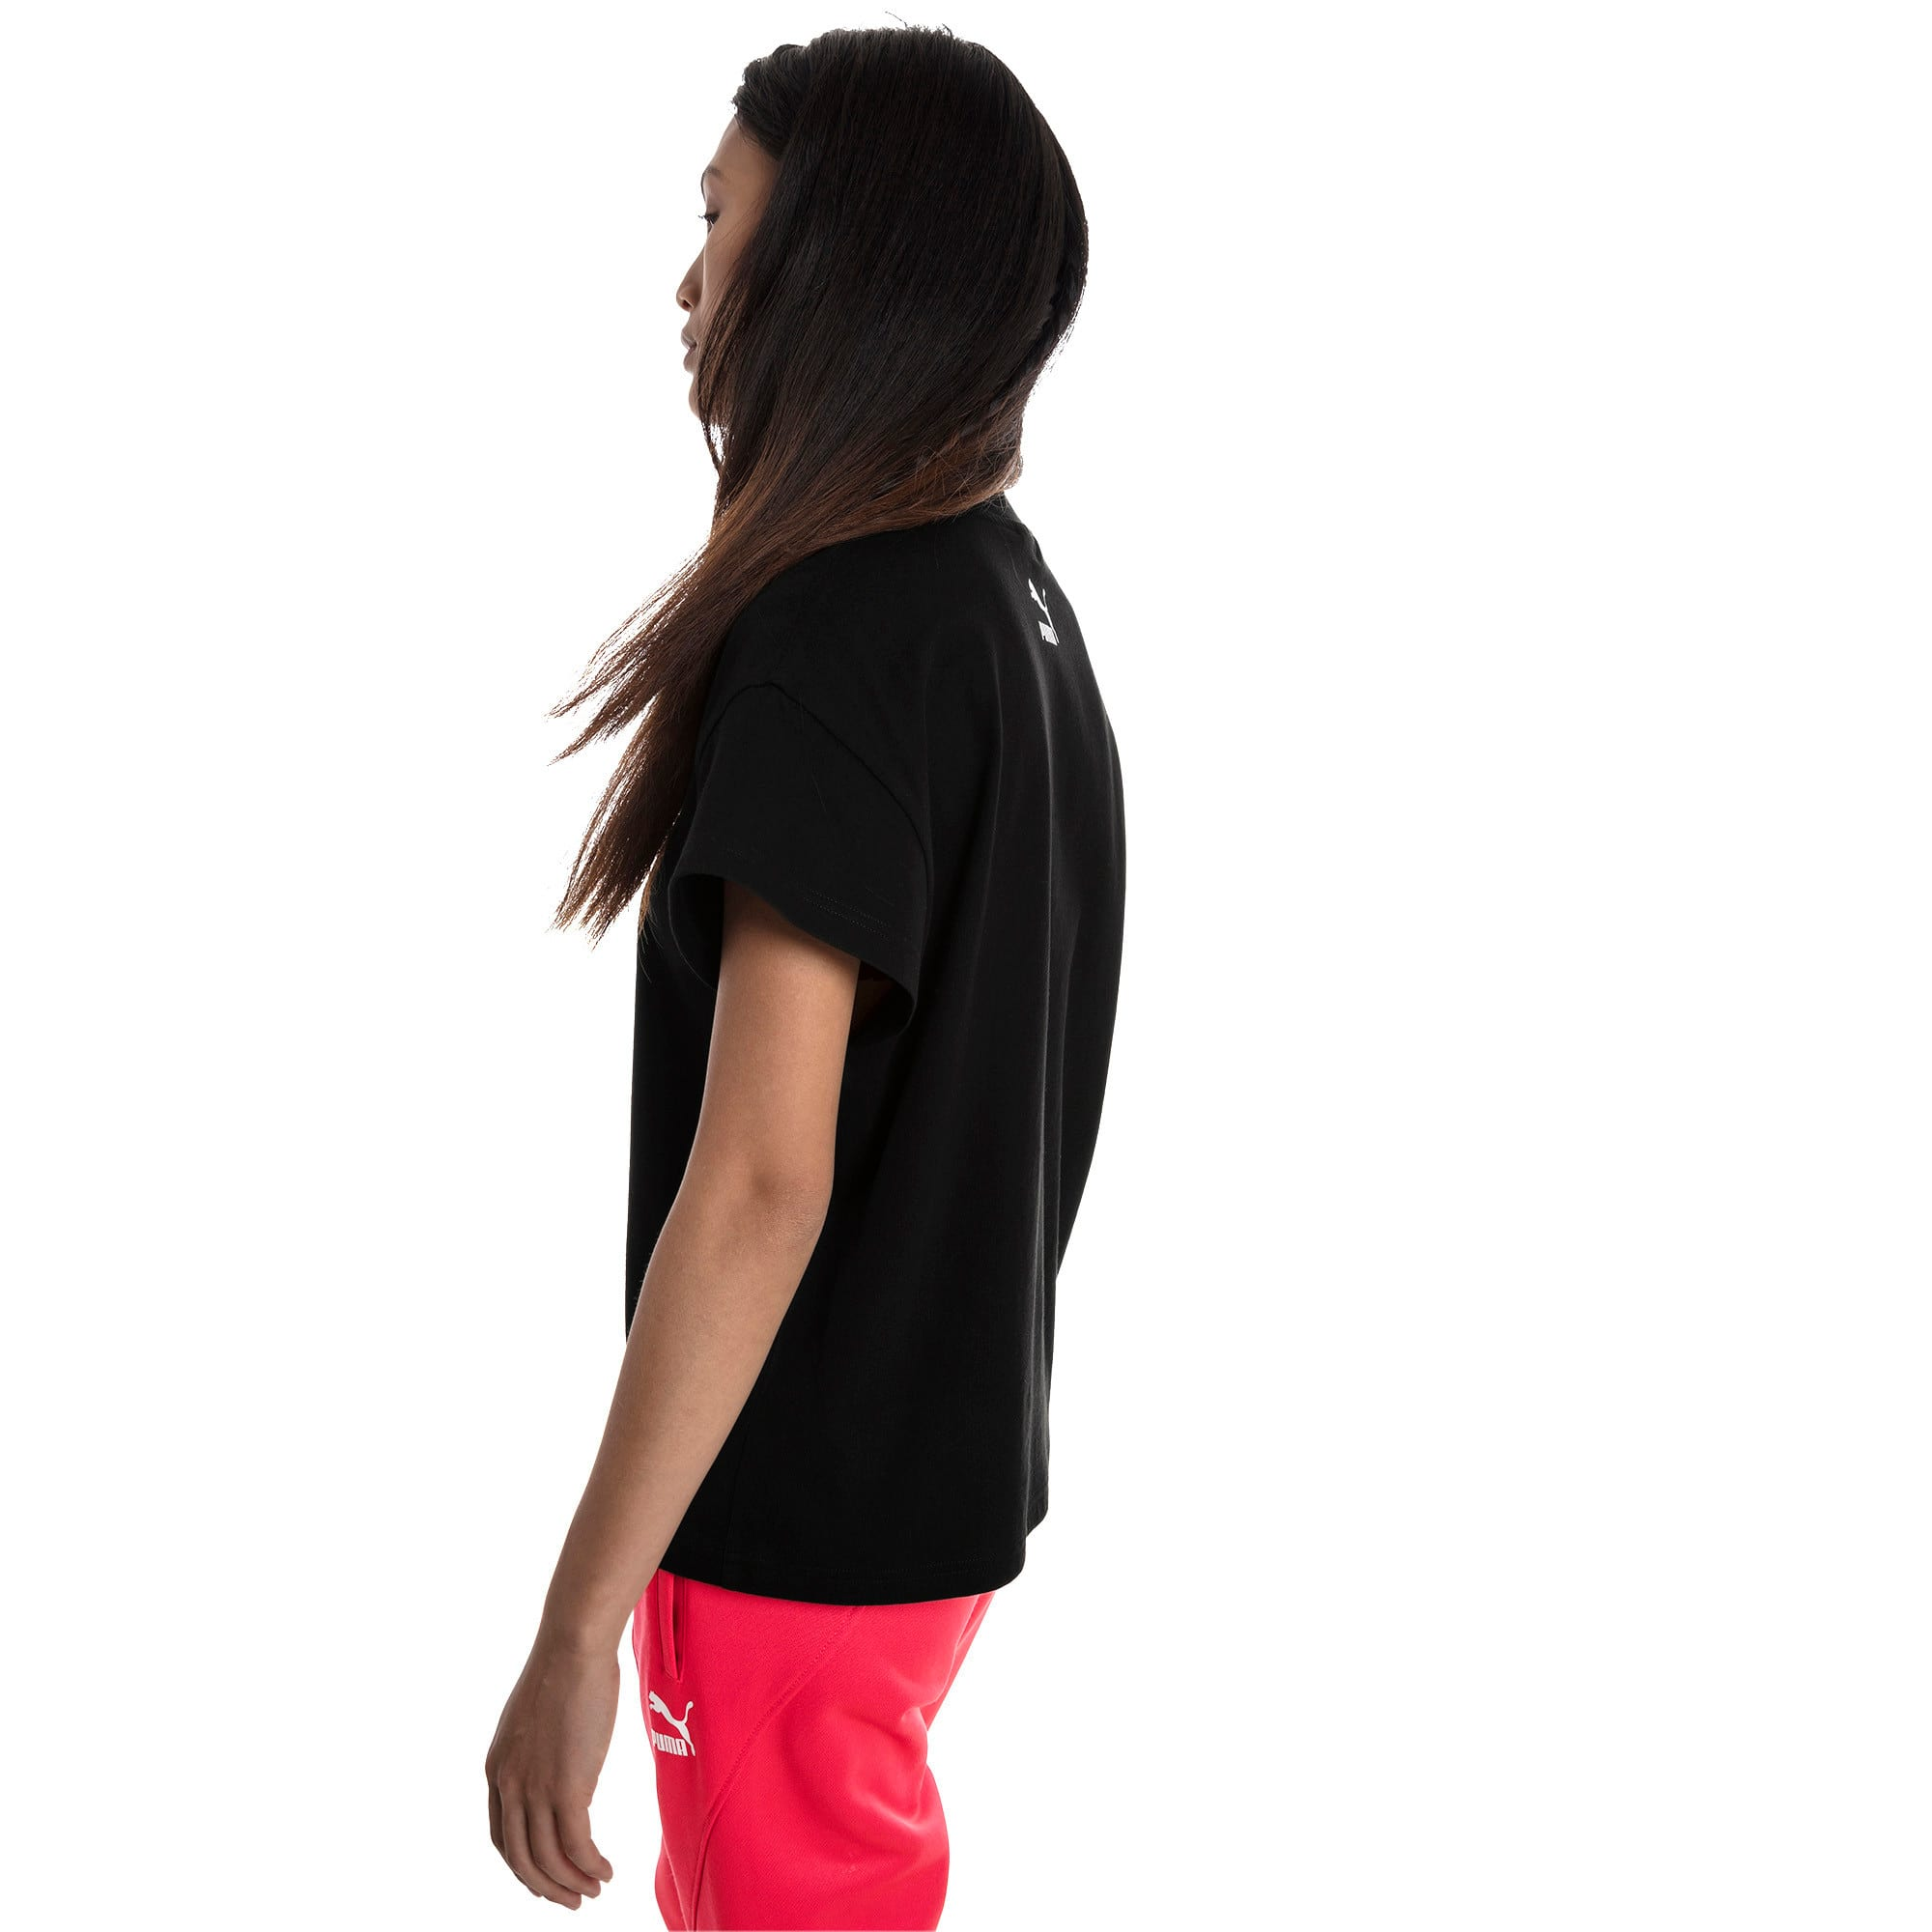 Thumbnail 3 of PUMA XTG グラフィック ウィメンズ SS Tシャツ 半袖, Cotton Black, medium-JPN